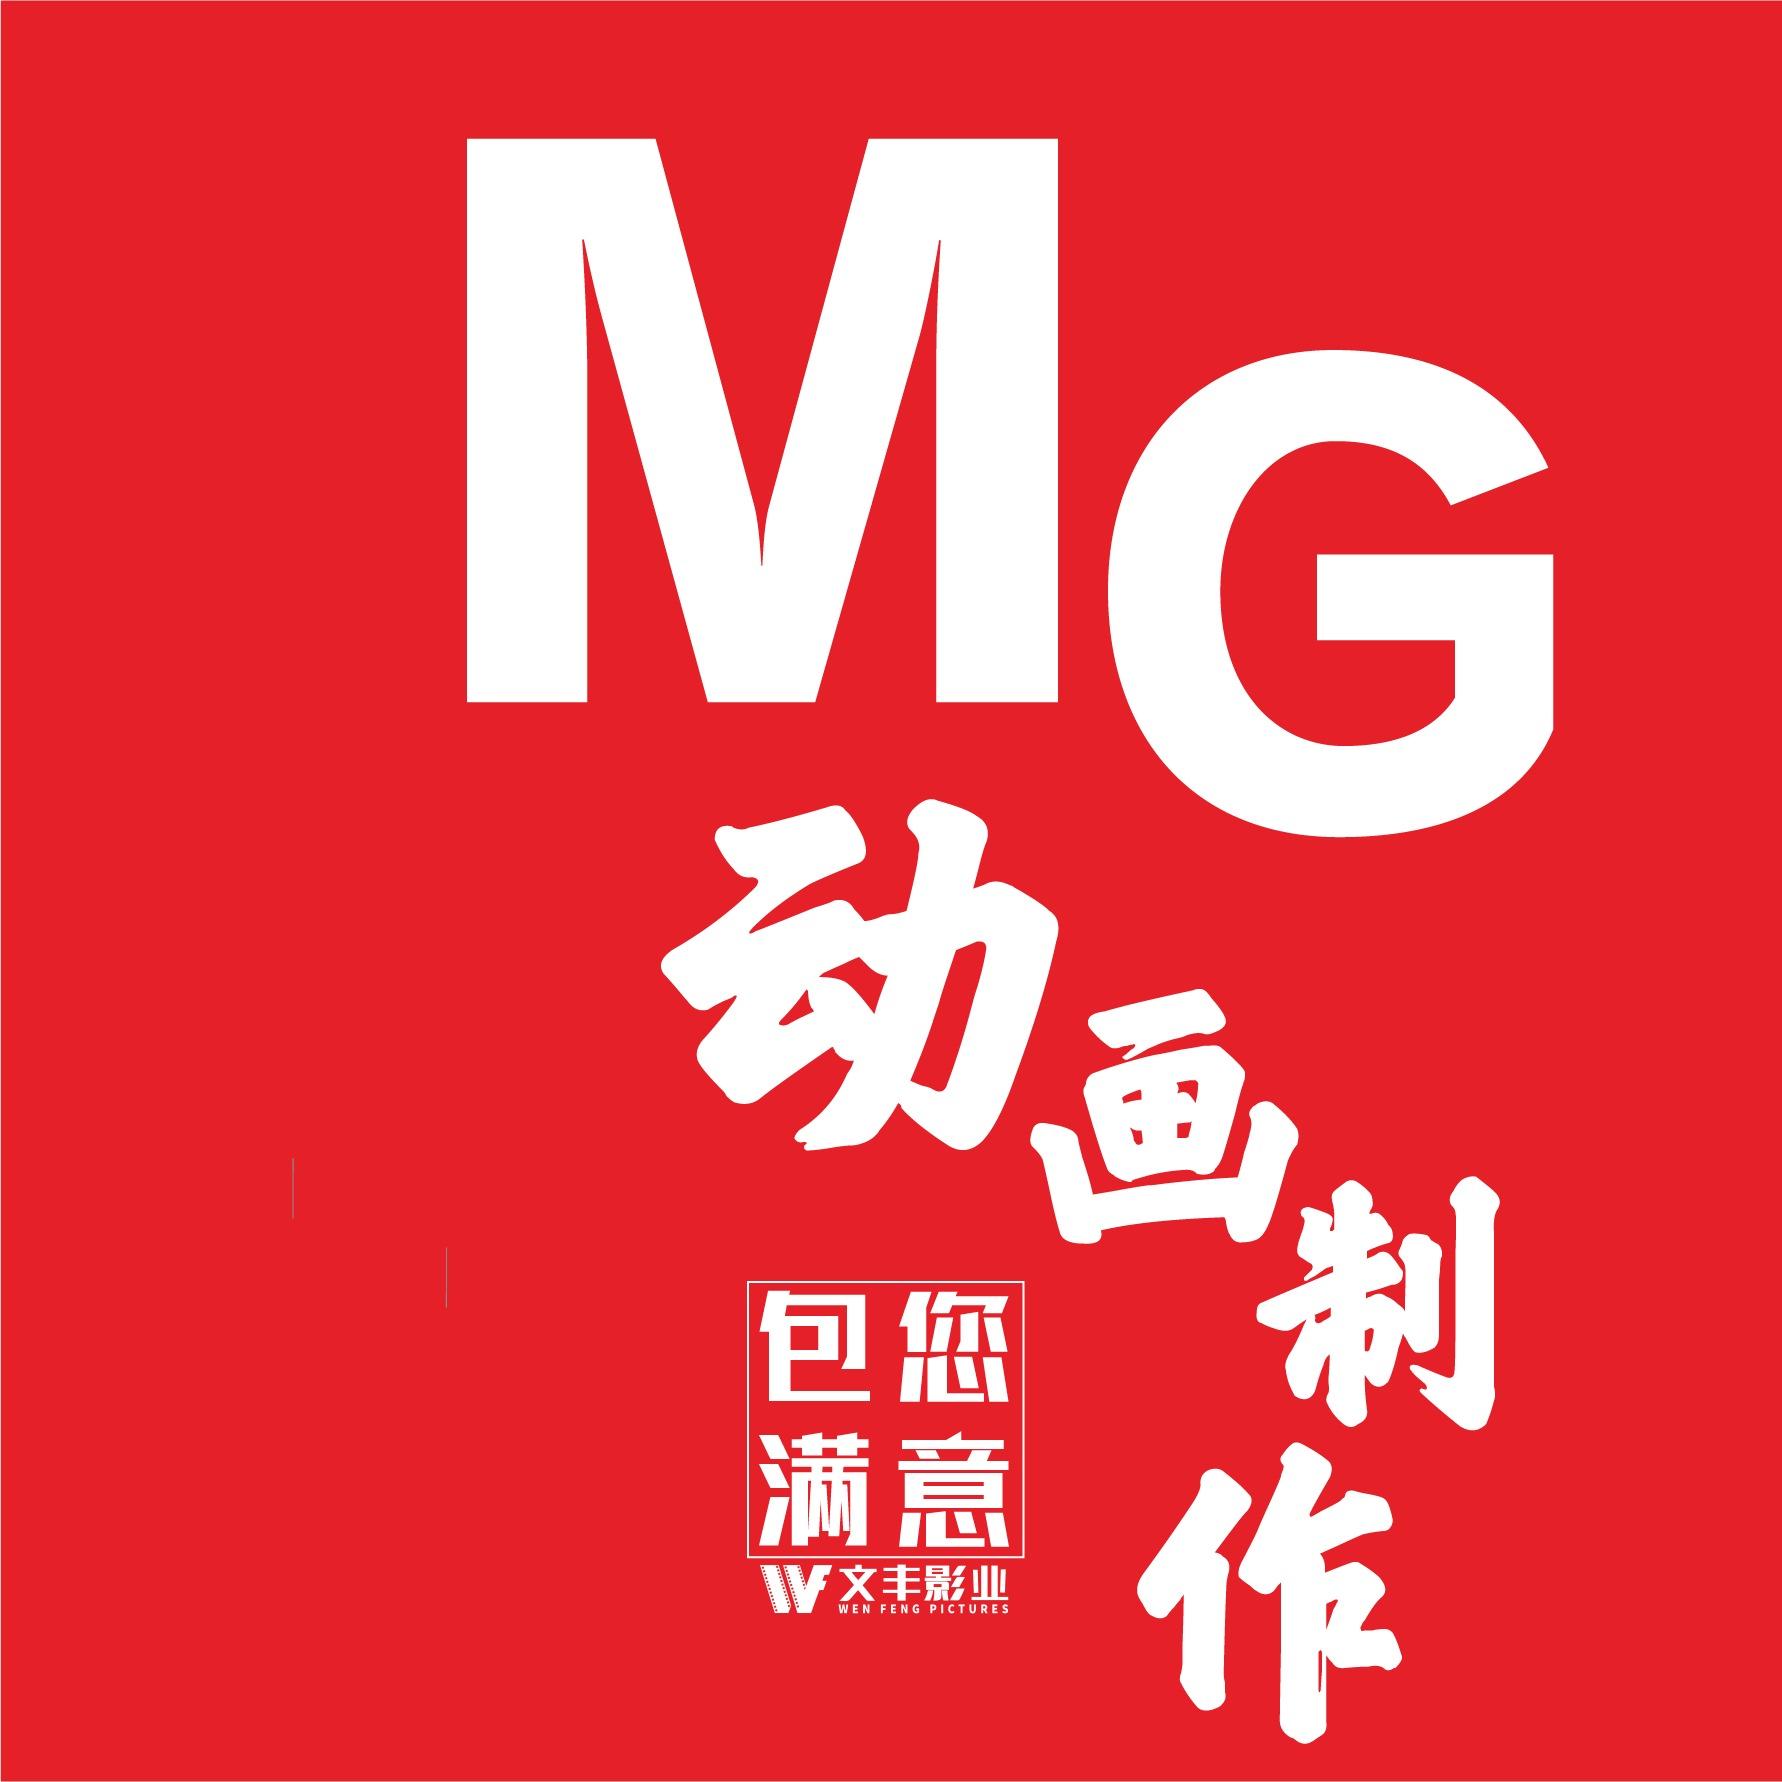 【MG动画制作】mg视频制作/二维动画设计/飞碟说动画/